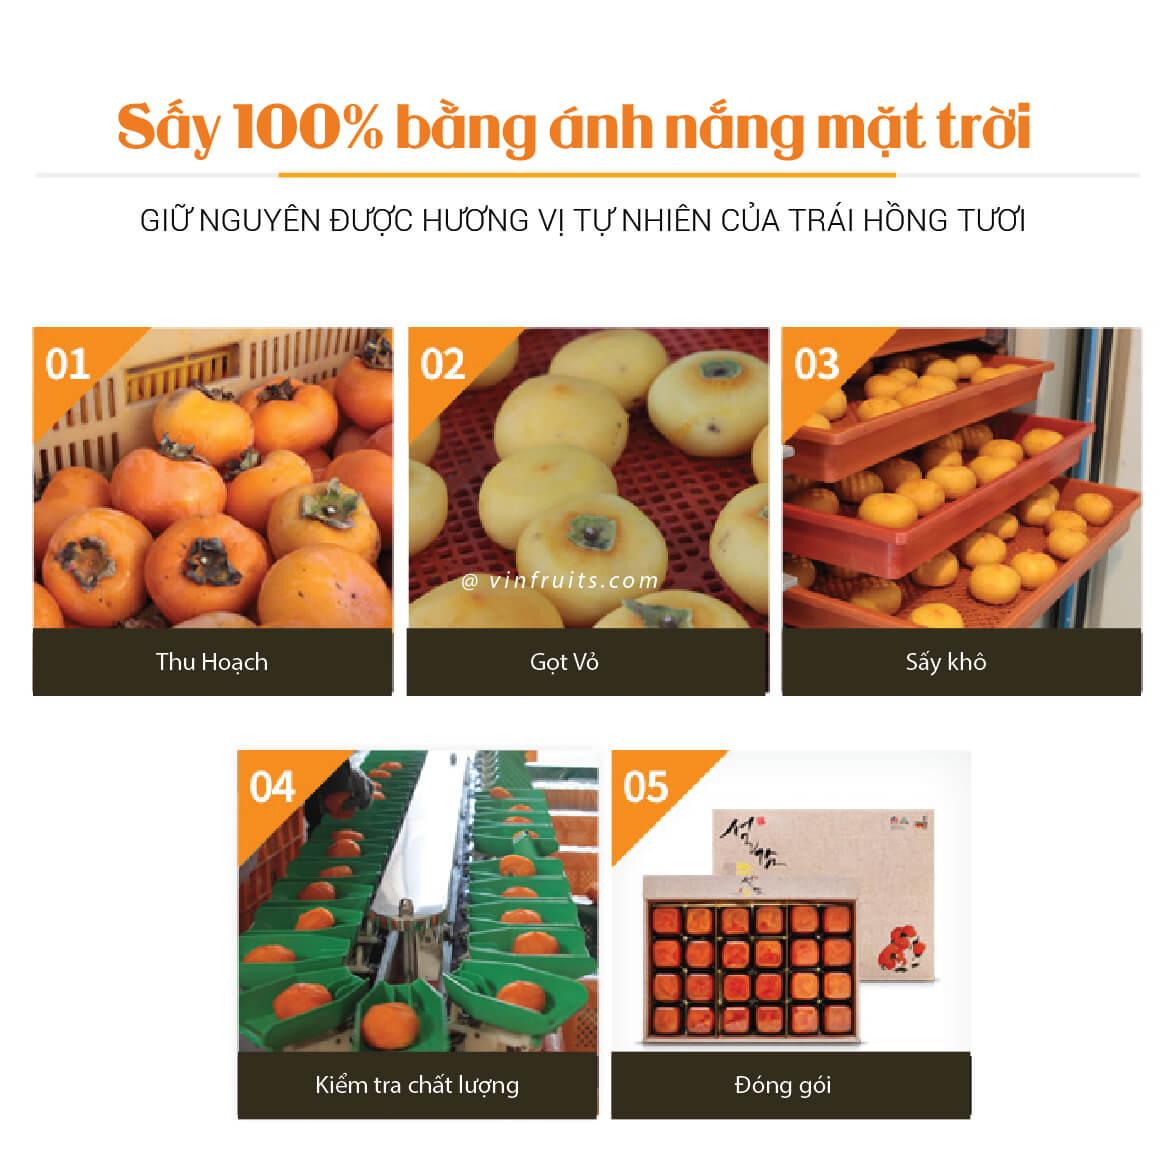 Hong mot nang Han Quoc - vinfruits.com 4